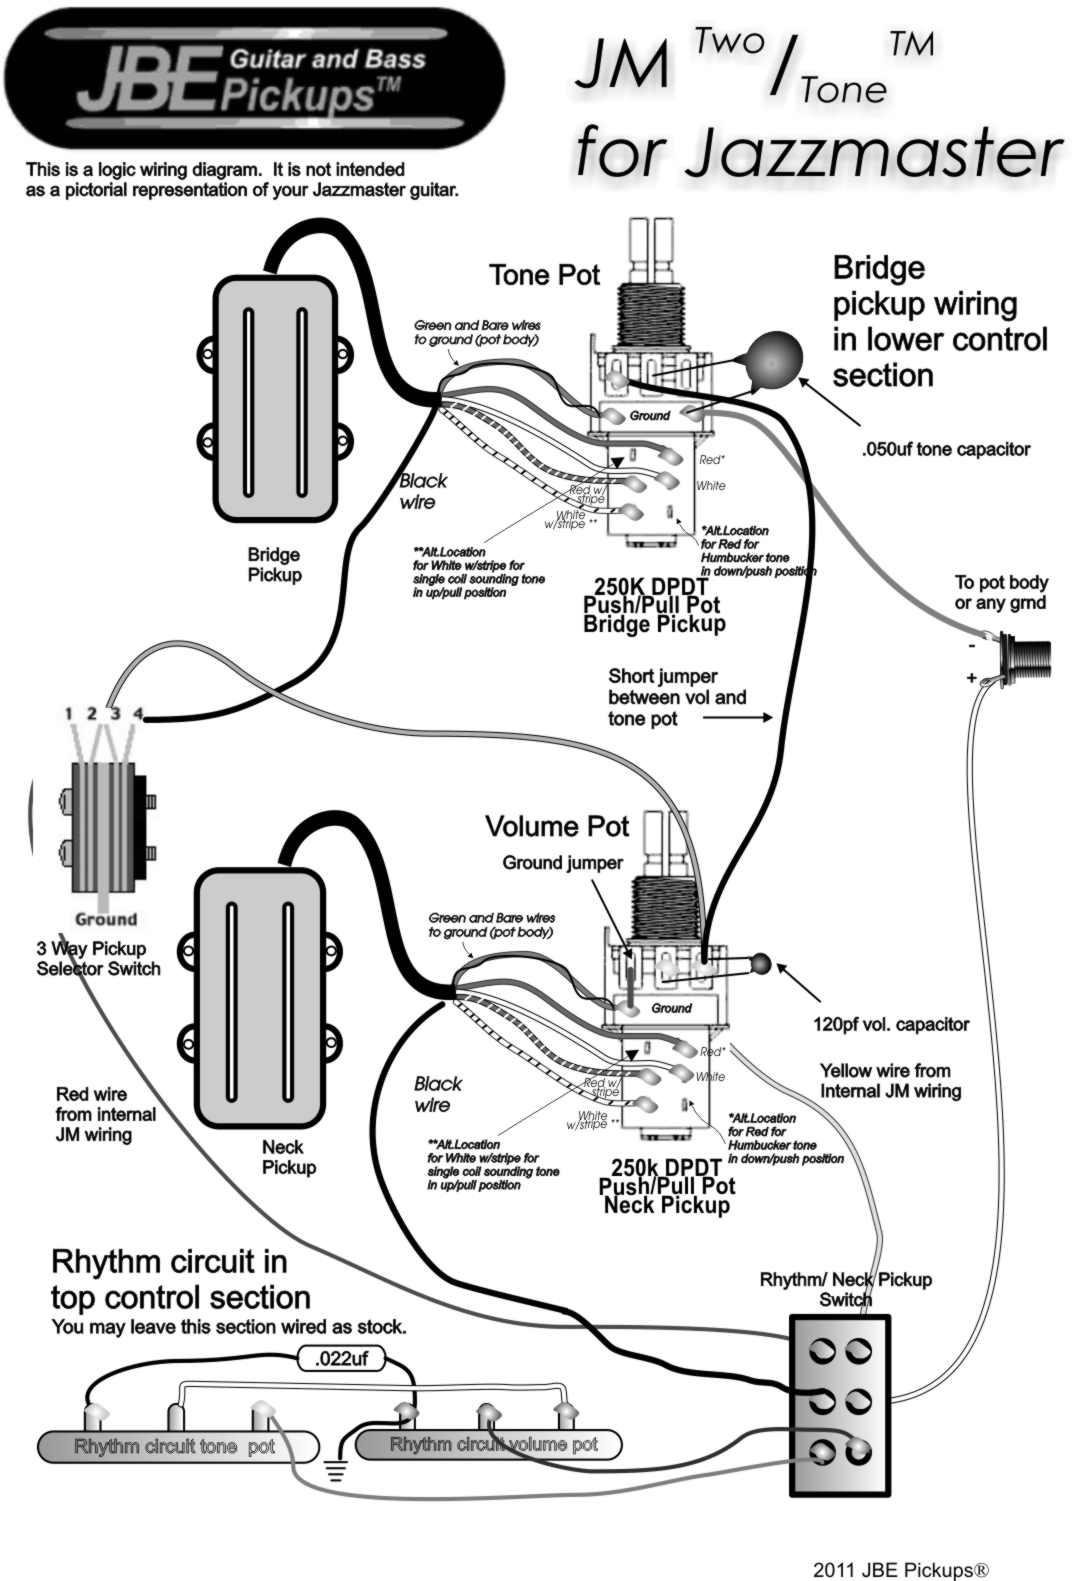 Hb And Hb Two Tone Humbucker Pickups | Jbe Pickups - Pickup Wiring Diagram